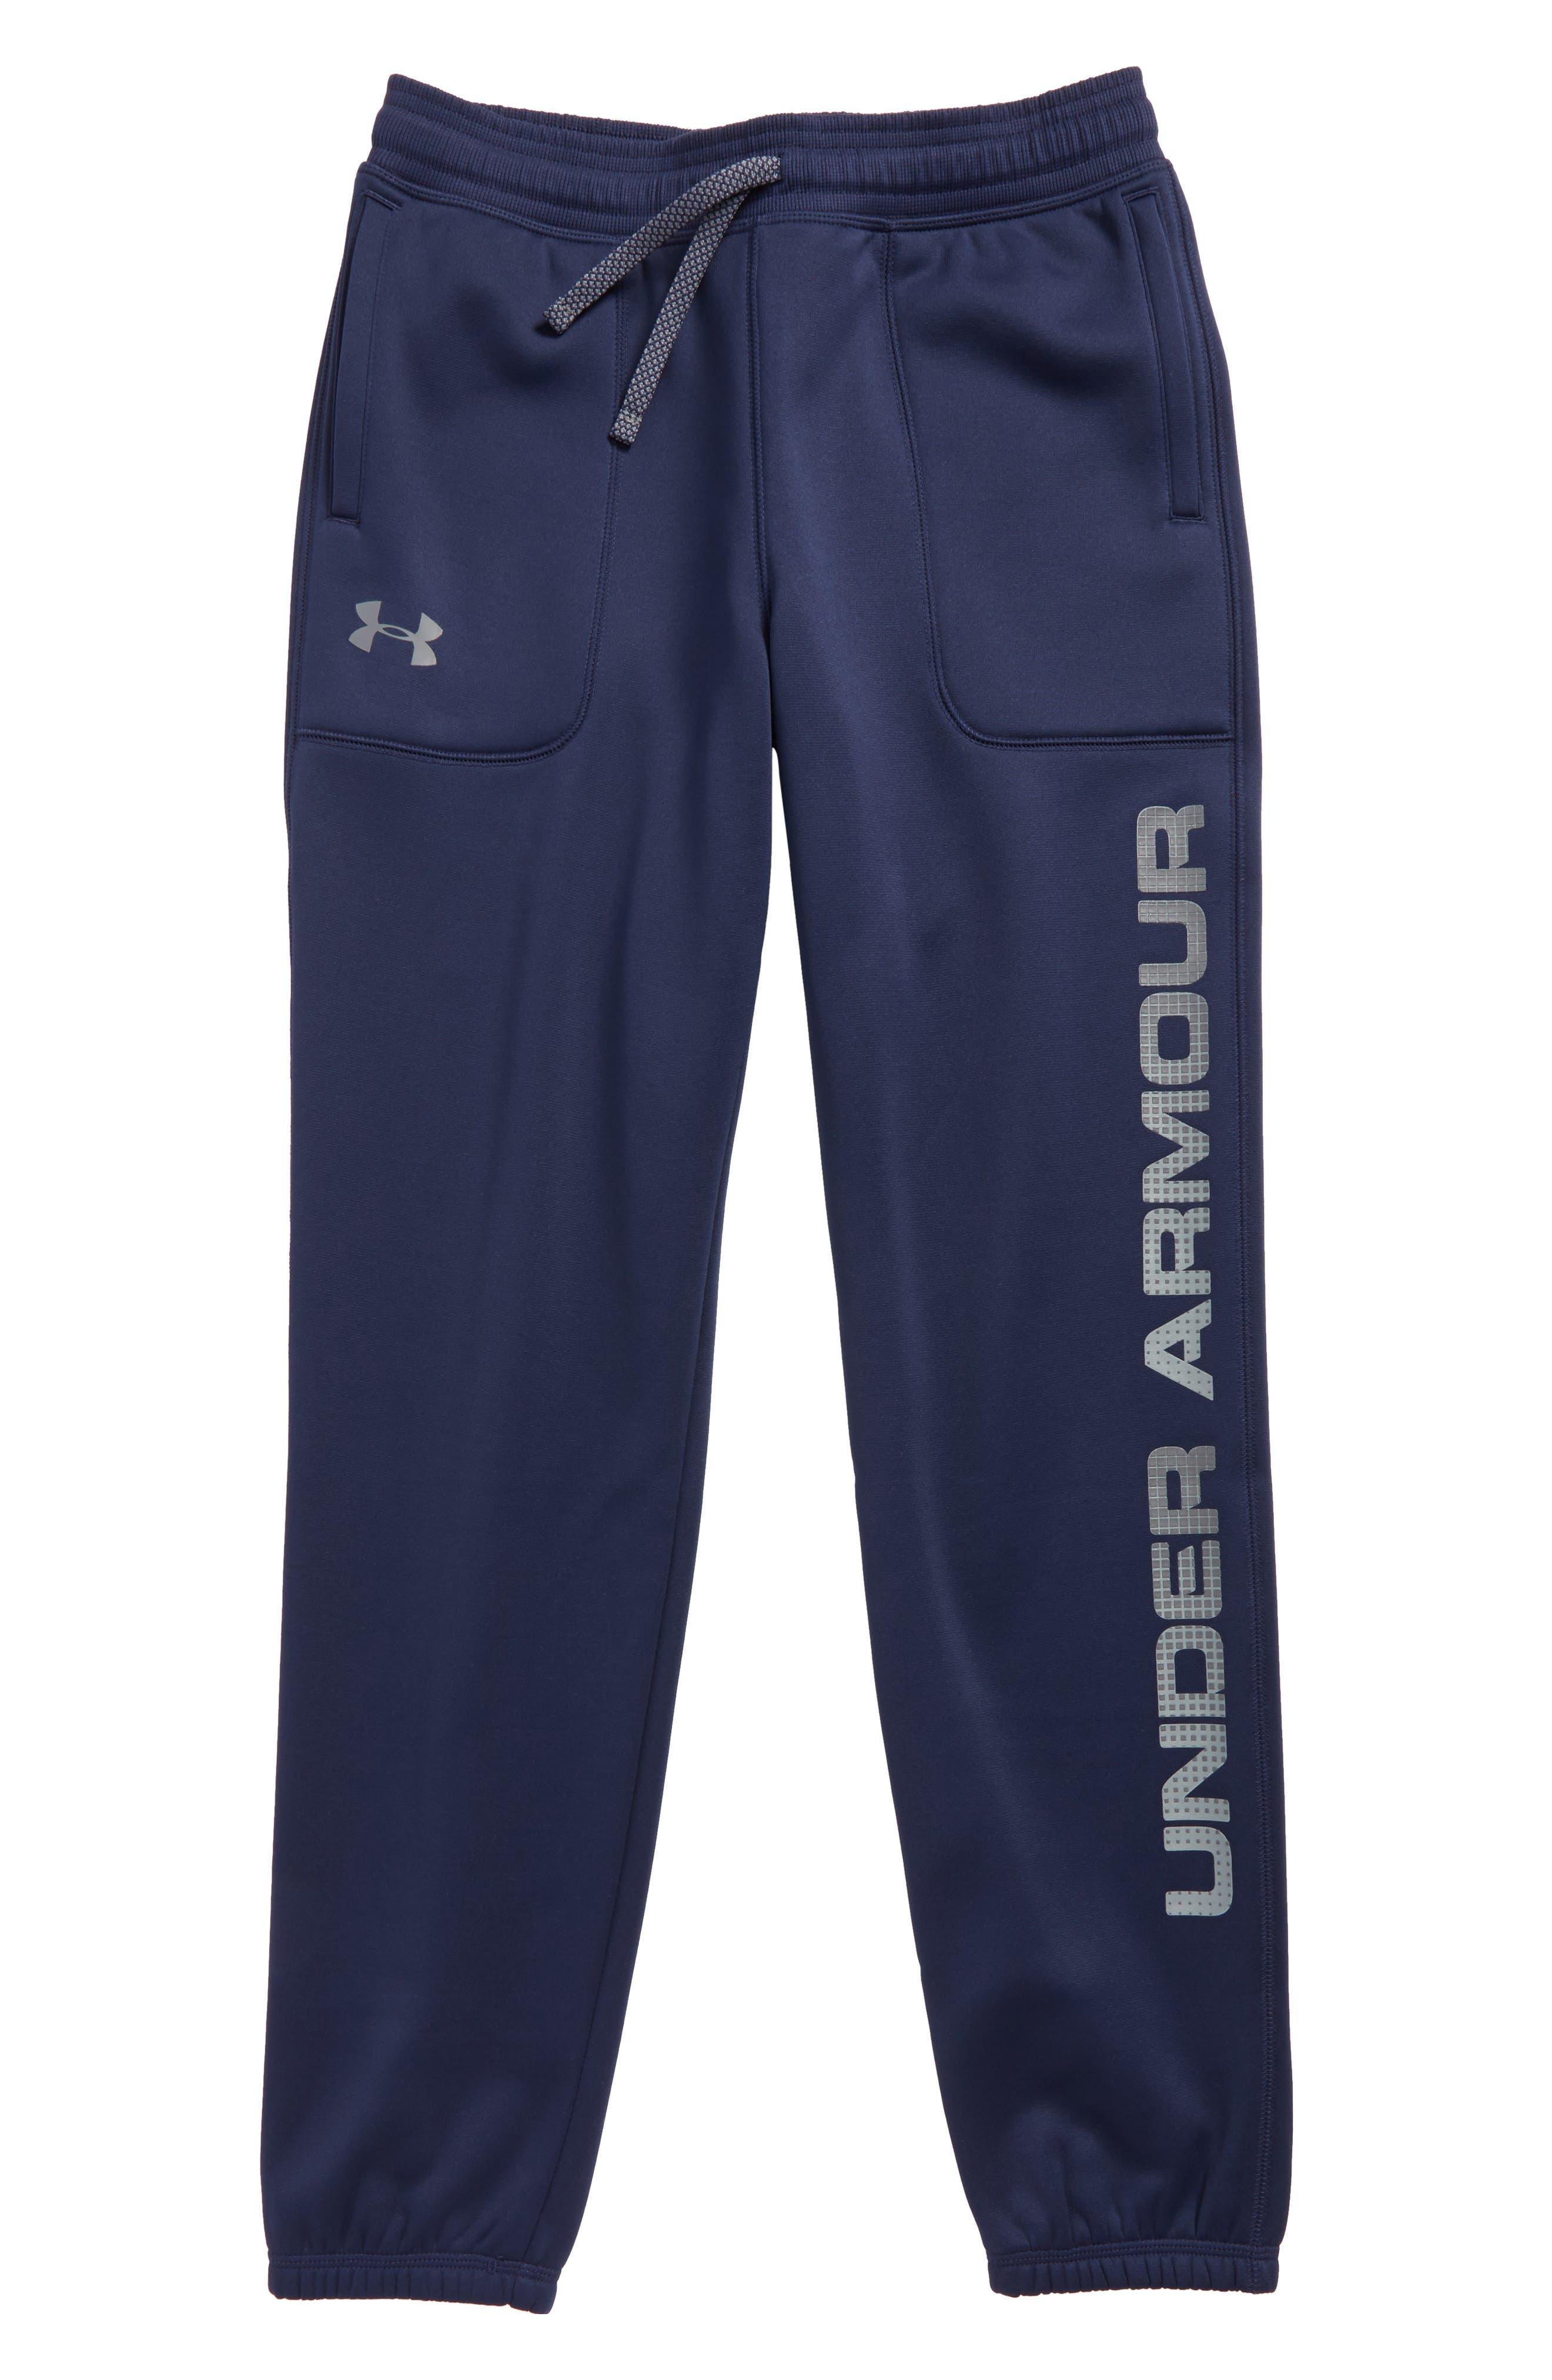 Storm ColdGear<sup>®</sup> Jogger Pants,                         Main,                         color, Midnight Navy/ Graphite